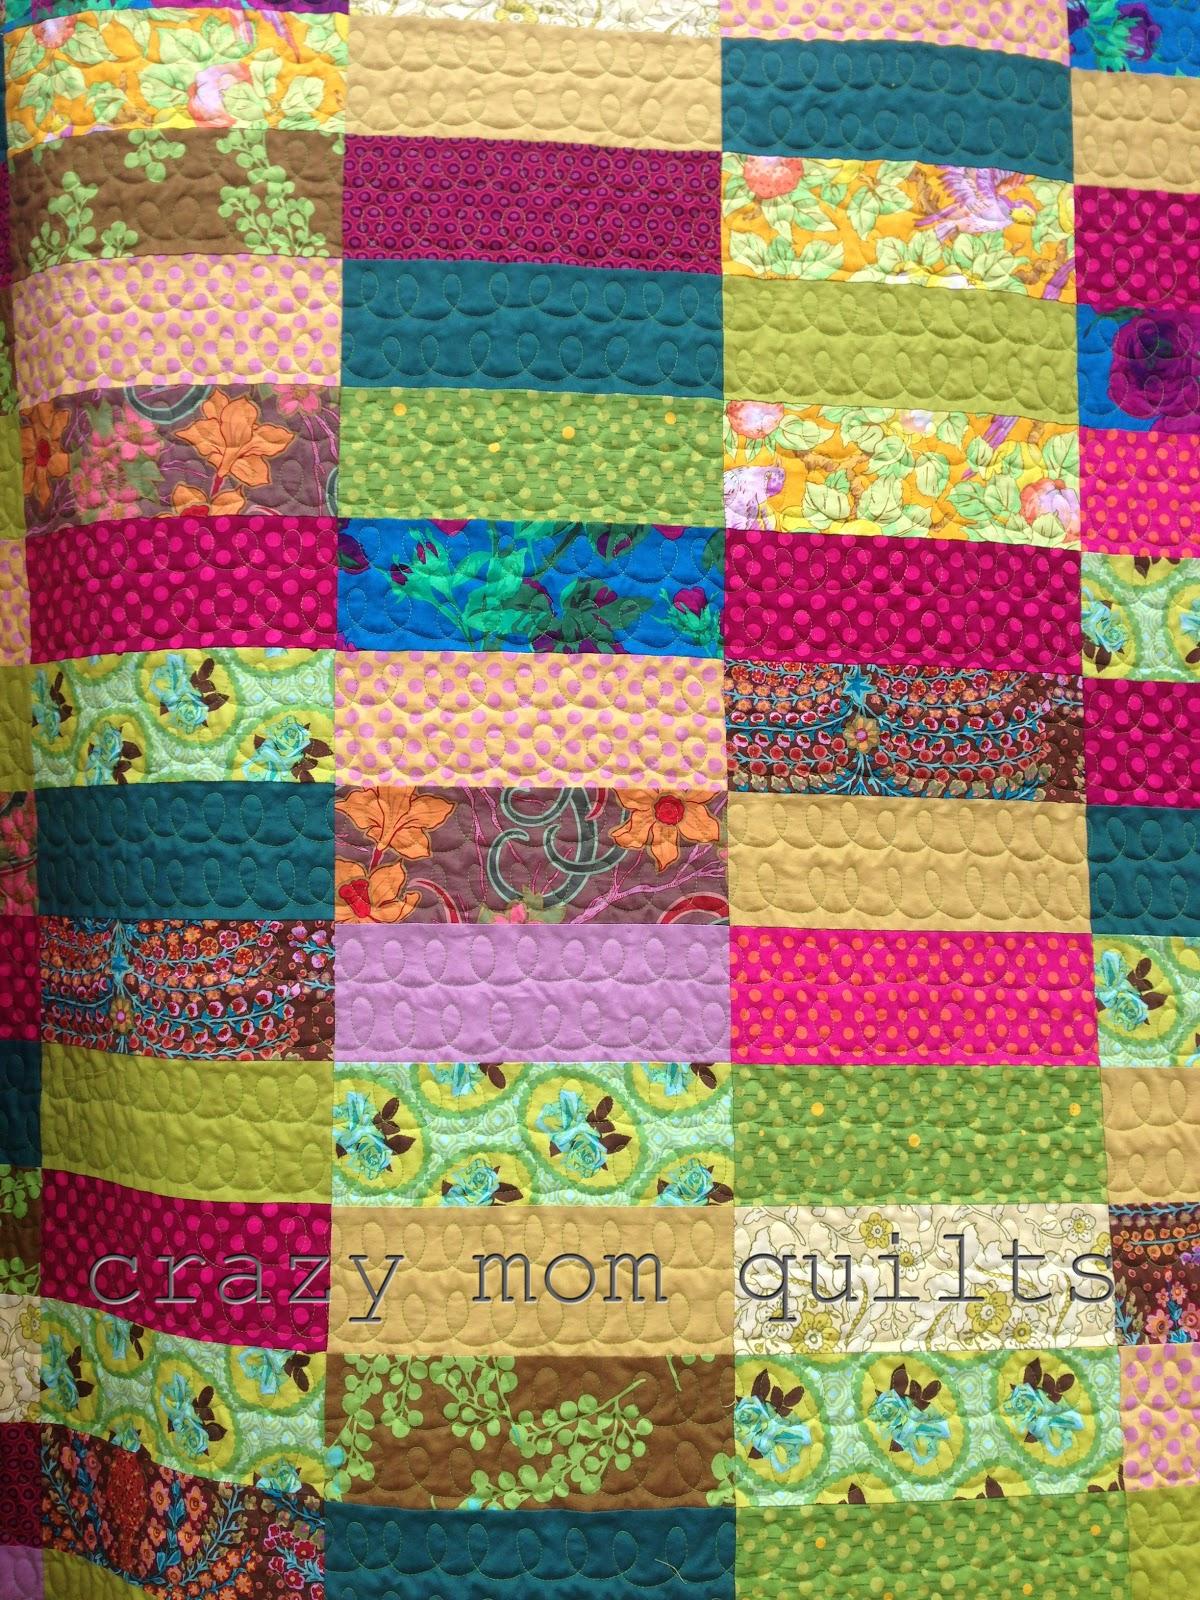 crazy mom quilts: bohemian garden quilt : crazy mom quilts - Adamdwight.com